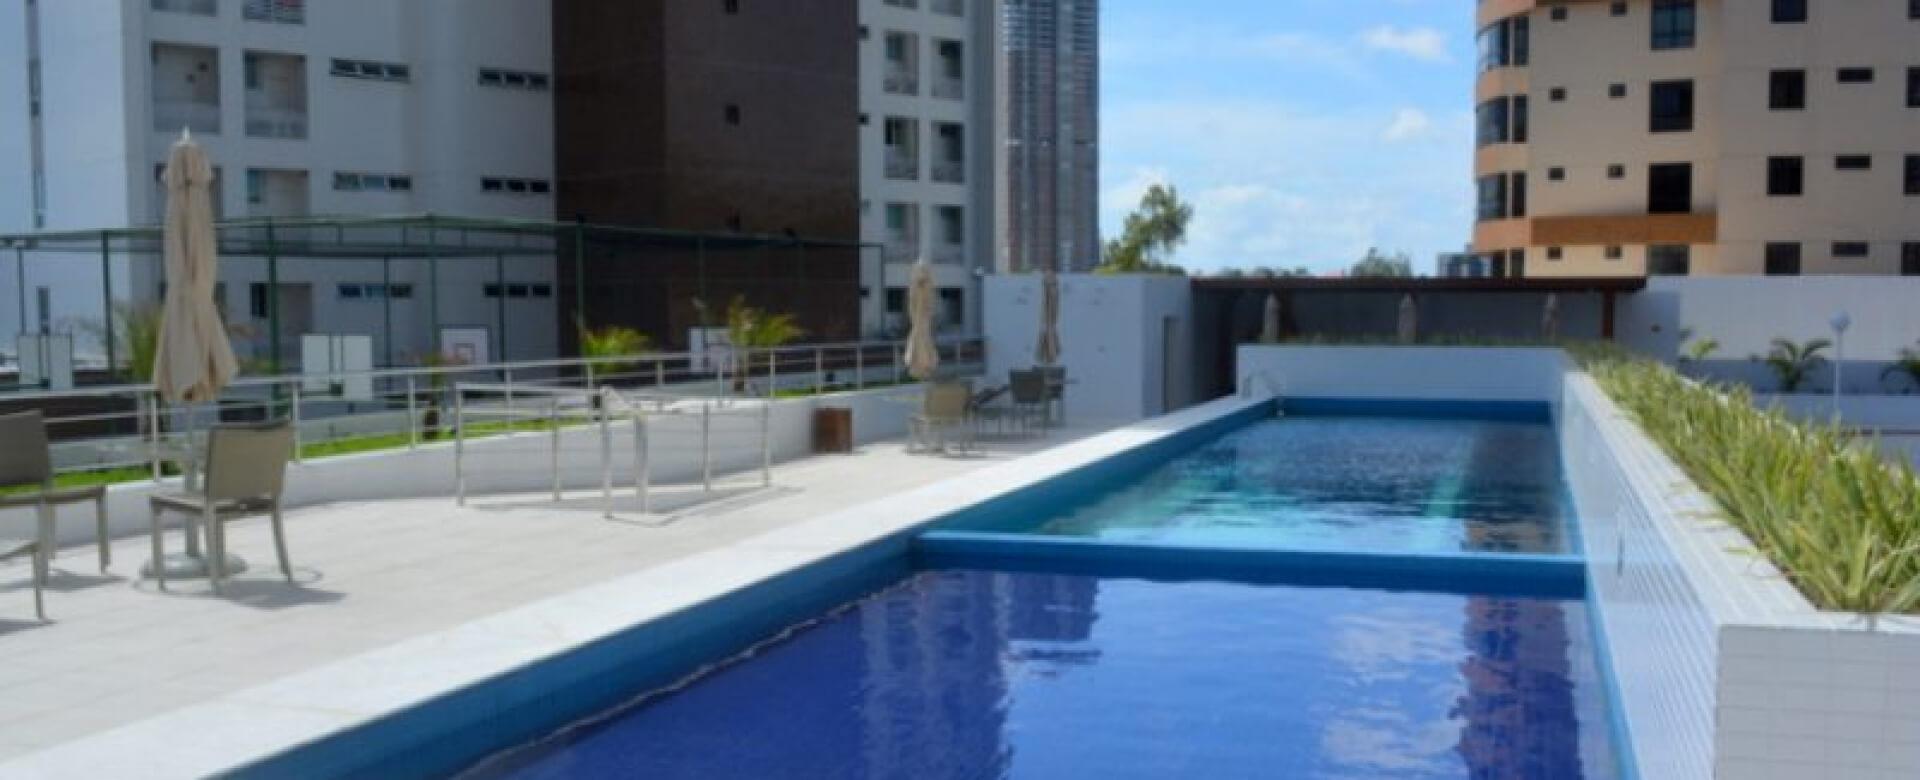 Maison Miramar Condomínio Club, foto 1